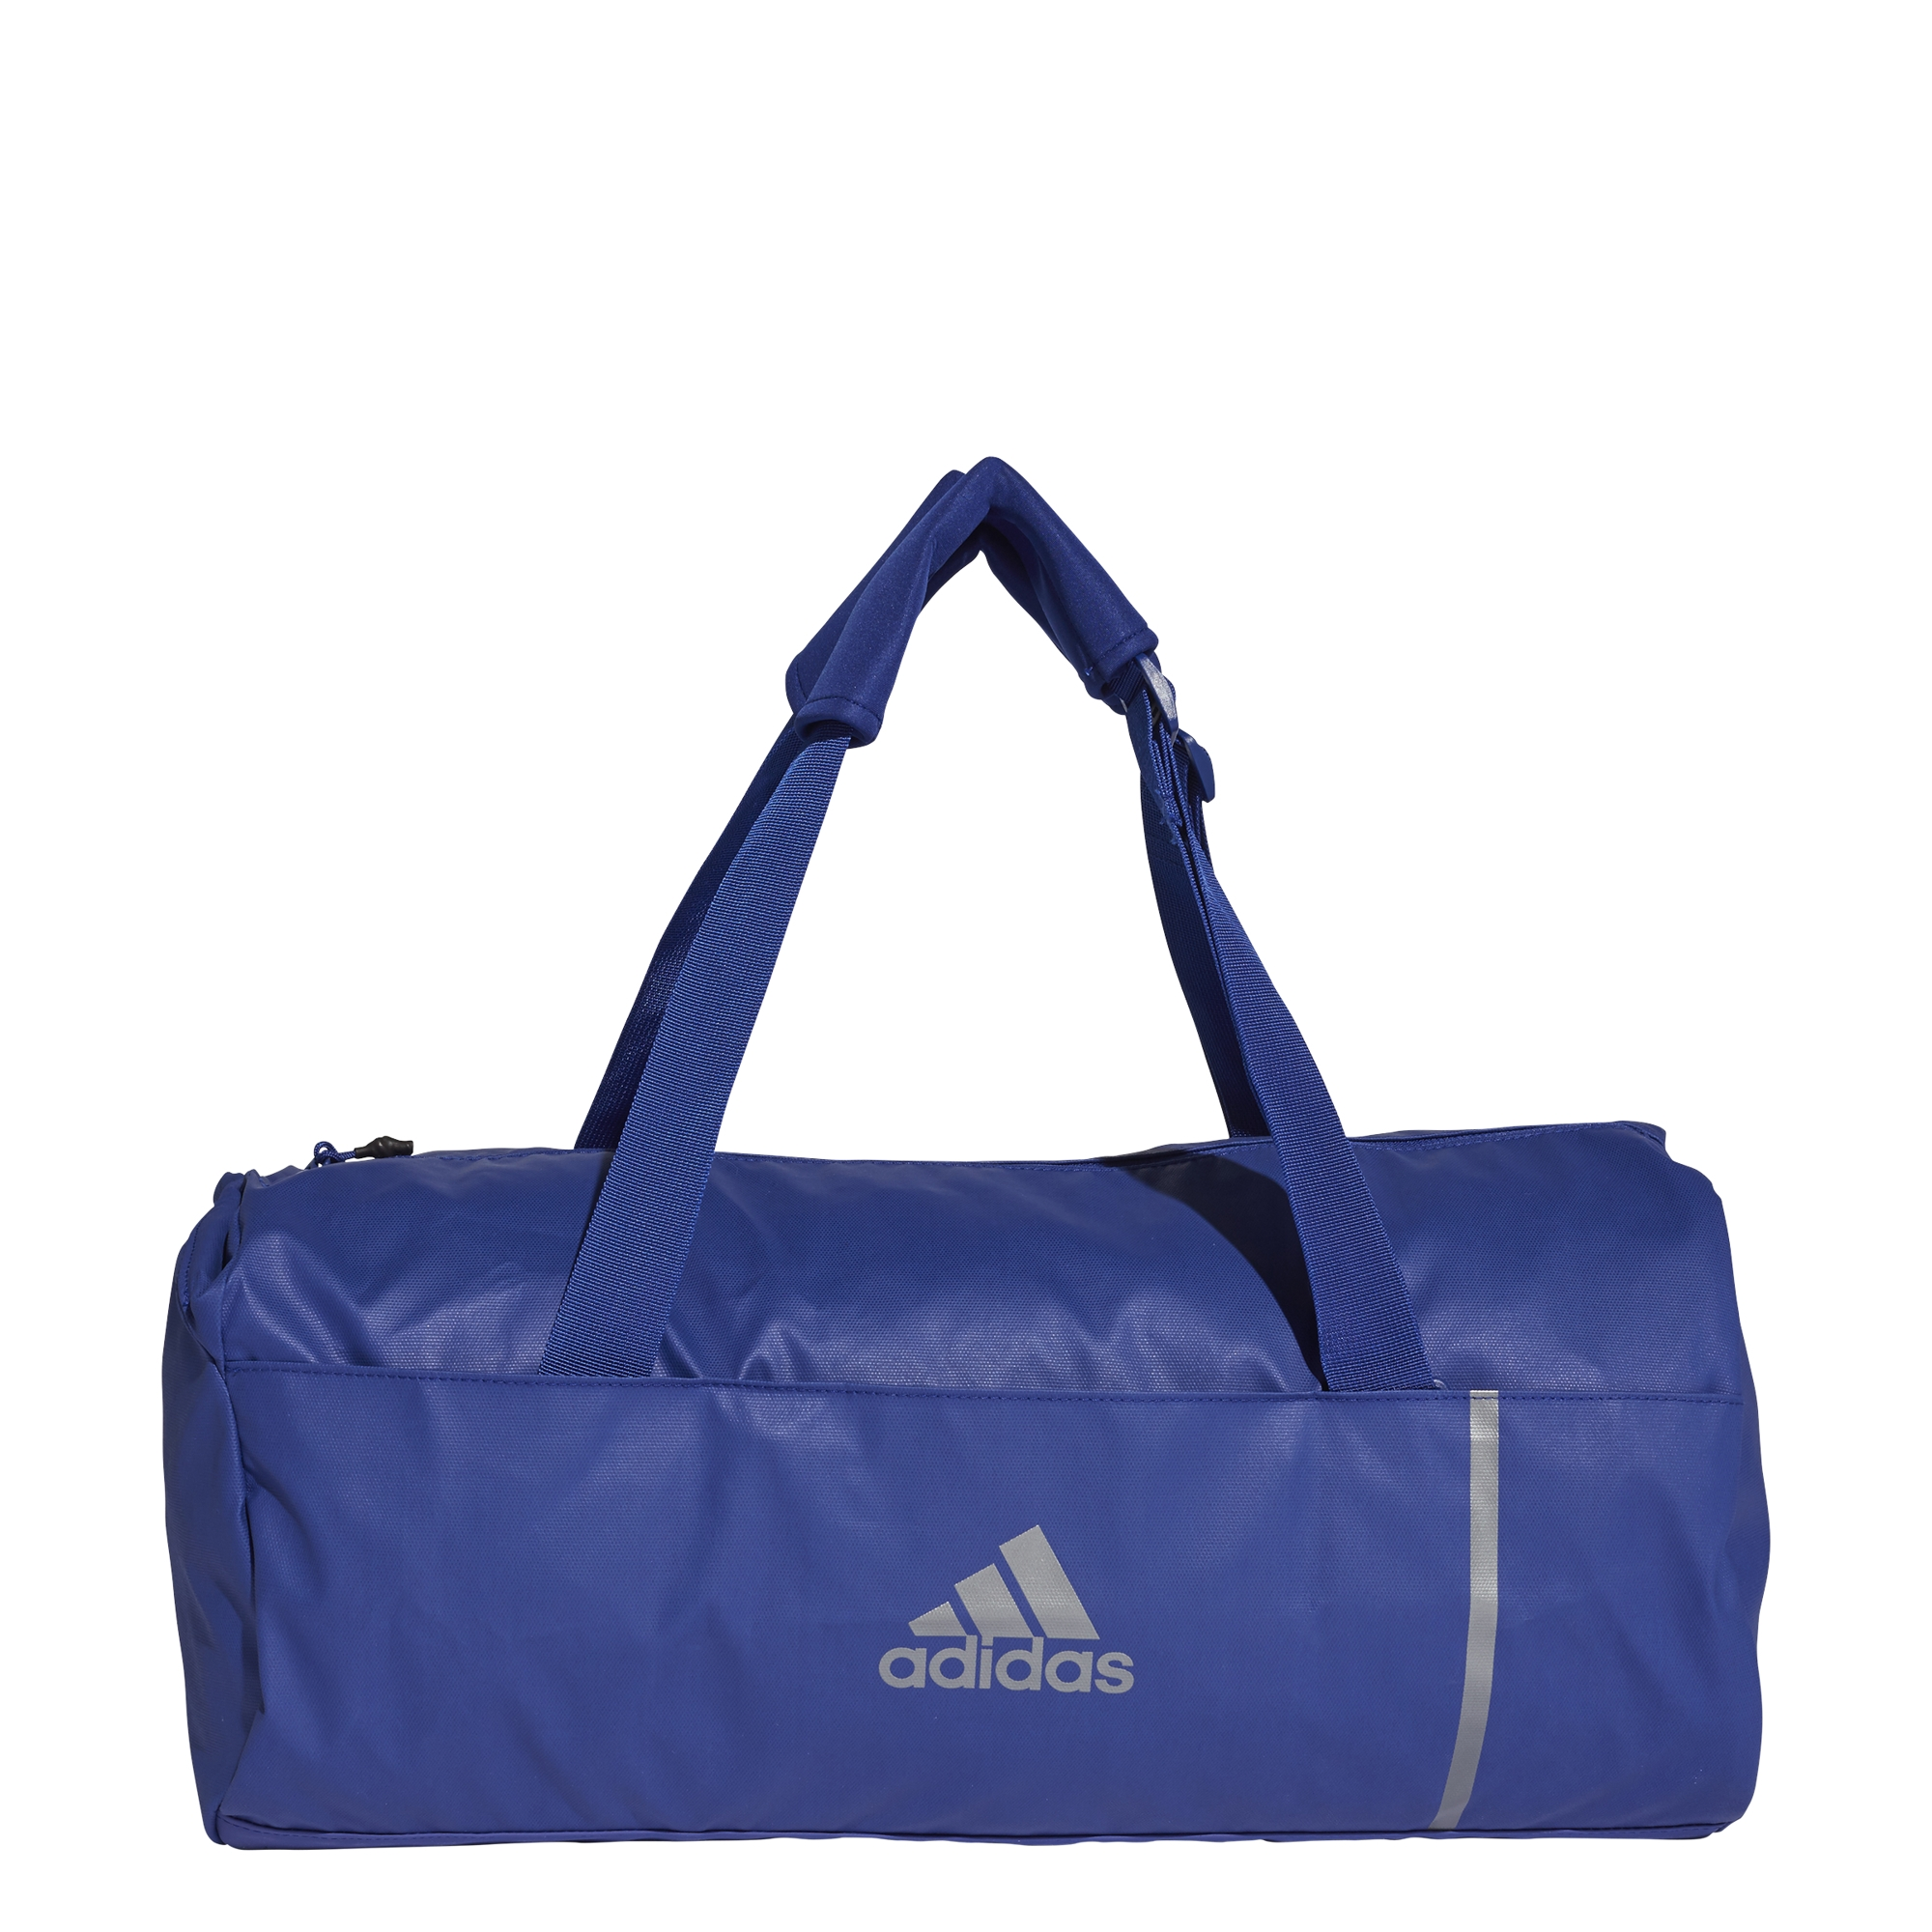 buy popular f0e05 253fc Sac adidas en toile Convertible Training Format moyen